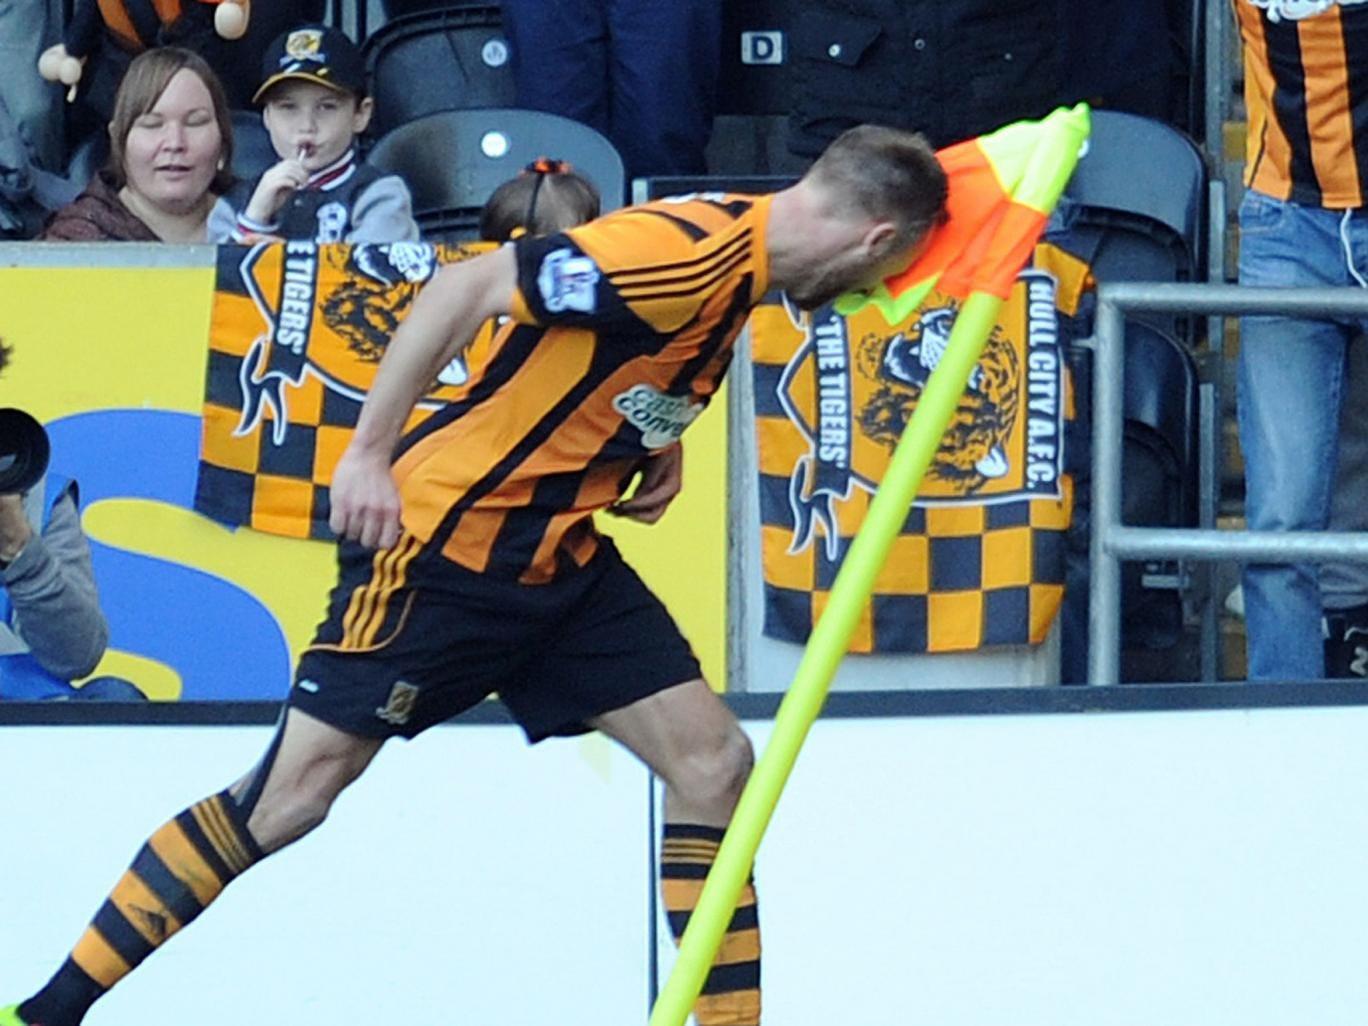 Hull's David Meyler celebrates his goal by headbutting the corner flag